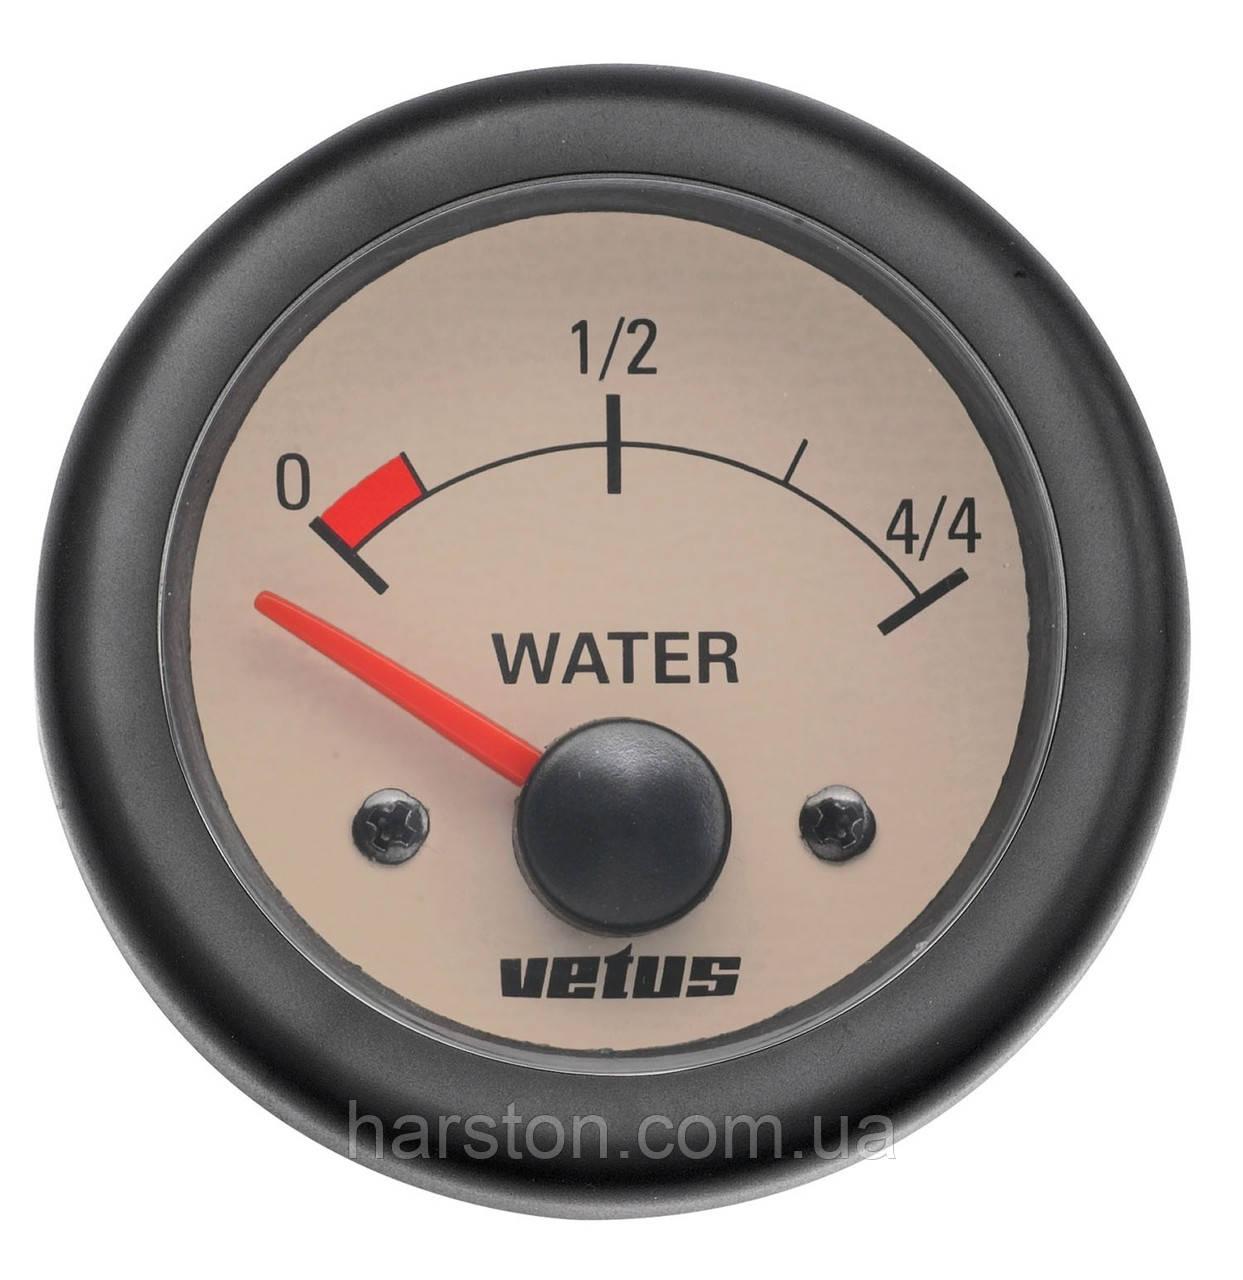 Индикатор воды VETUS WATER12W (WATER24W)